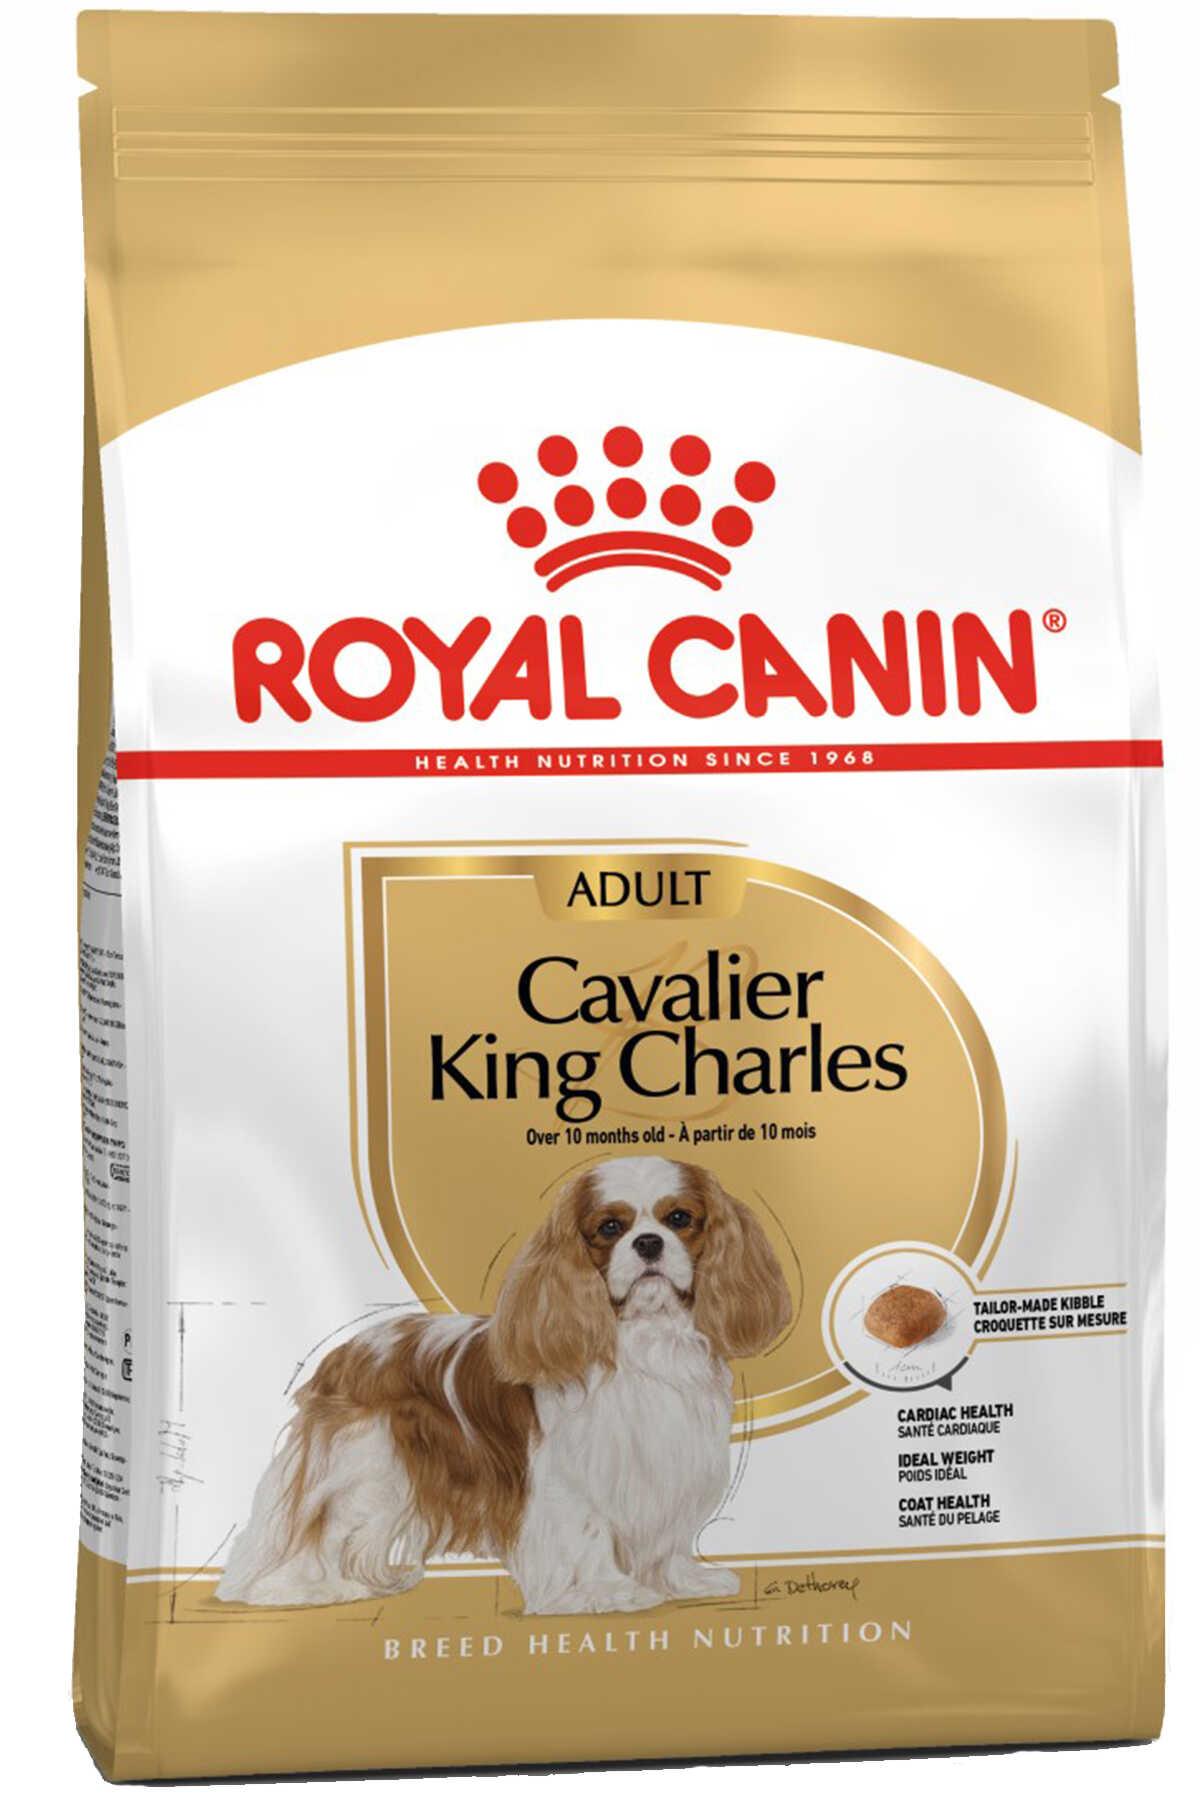 Royal Canin Cavalier King Charles Adult Yetişkin Köpek Maması 1,5kg